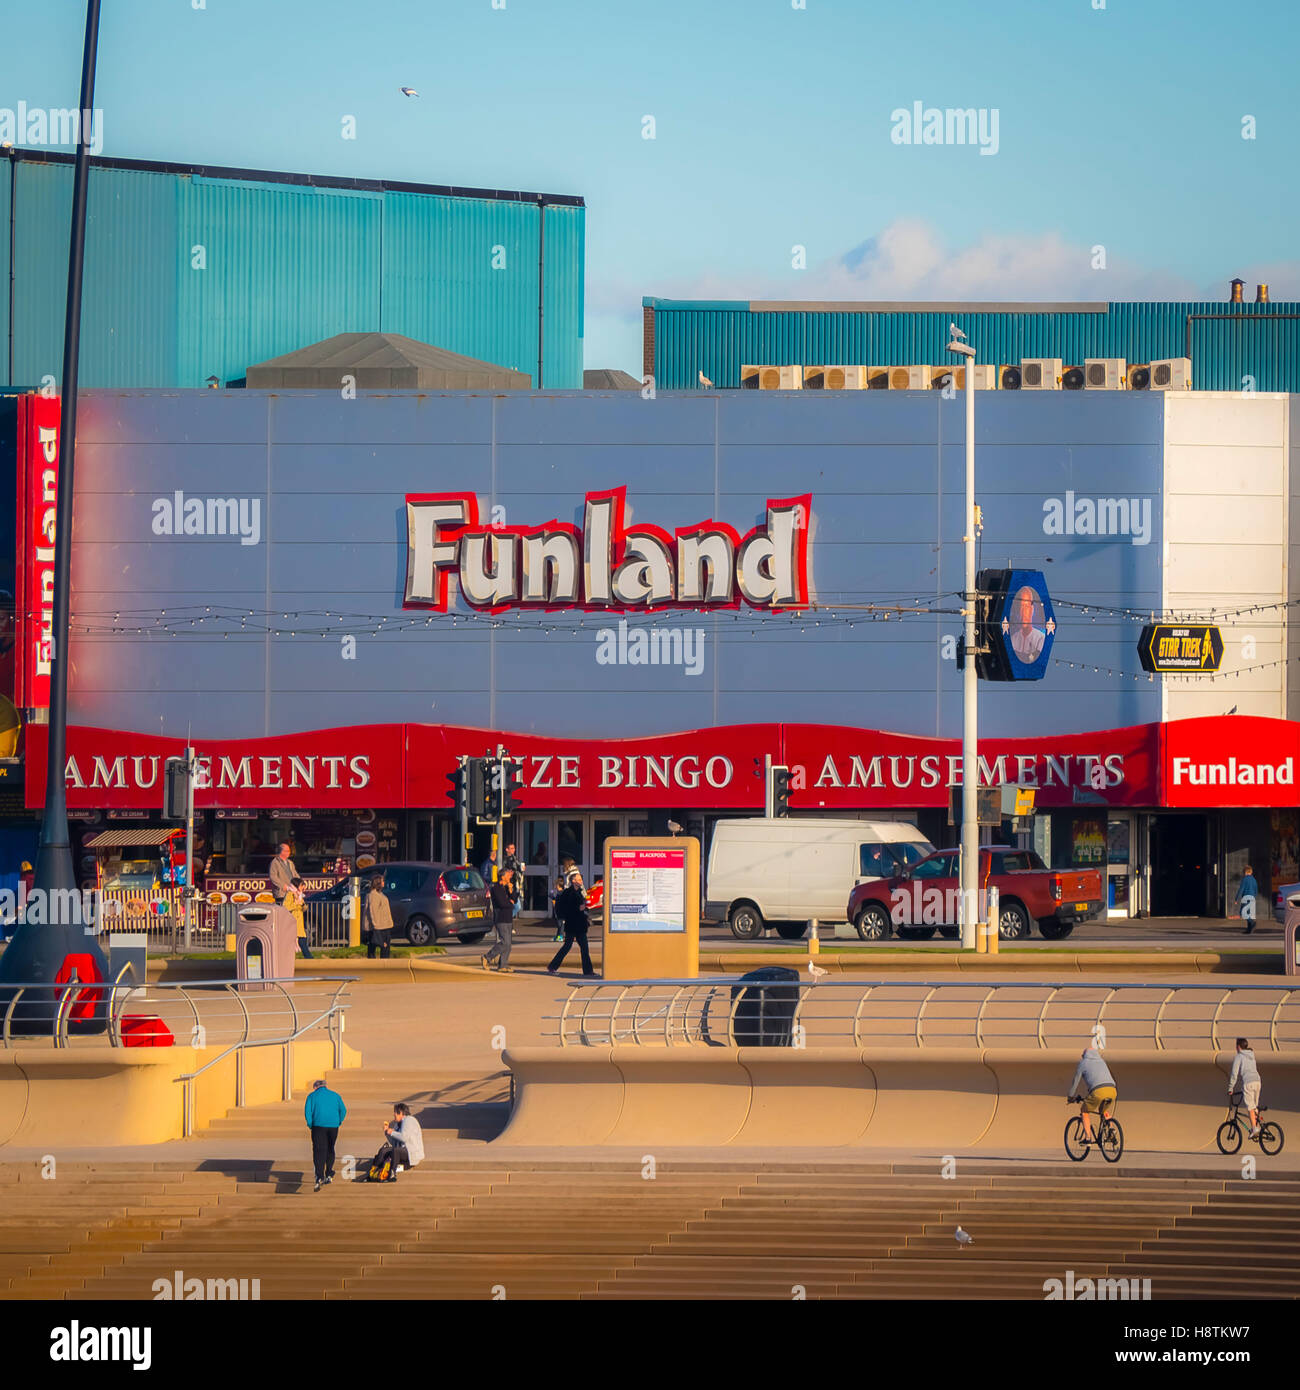 Funland bingo and amusements, Promenade, Blackpool, Lancashire, UK. - Stock Image